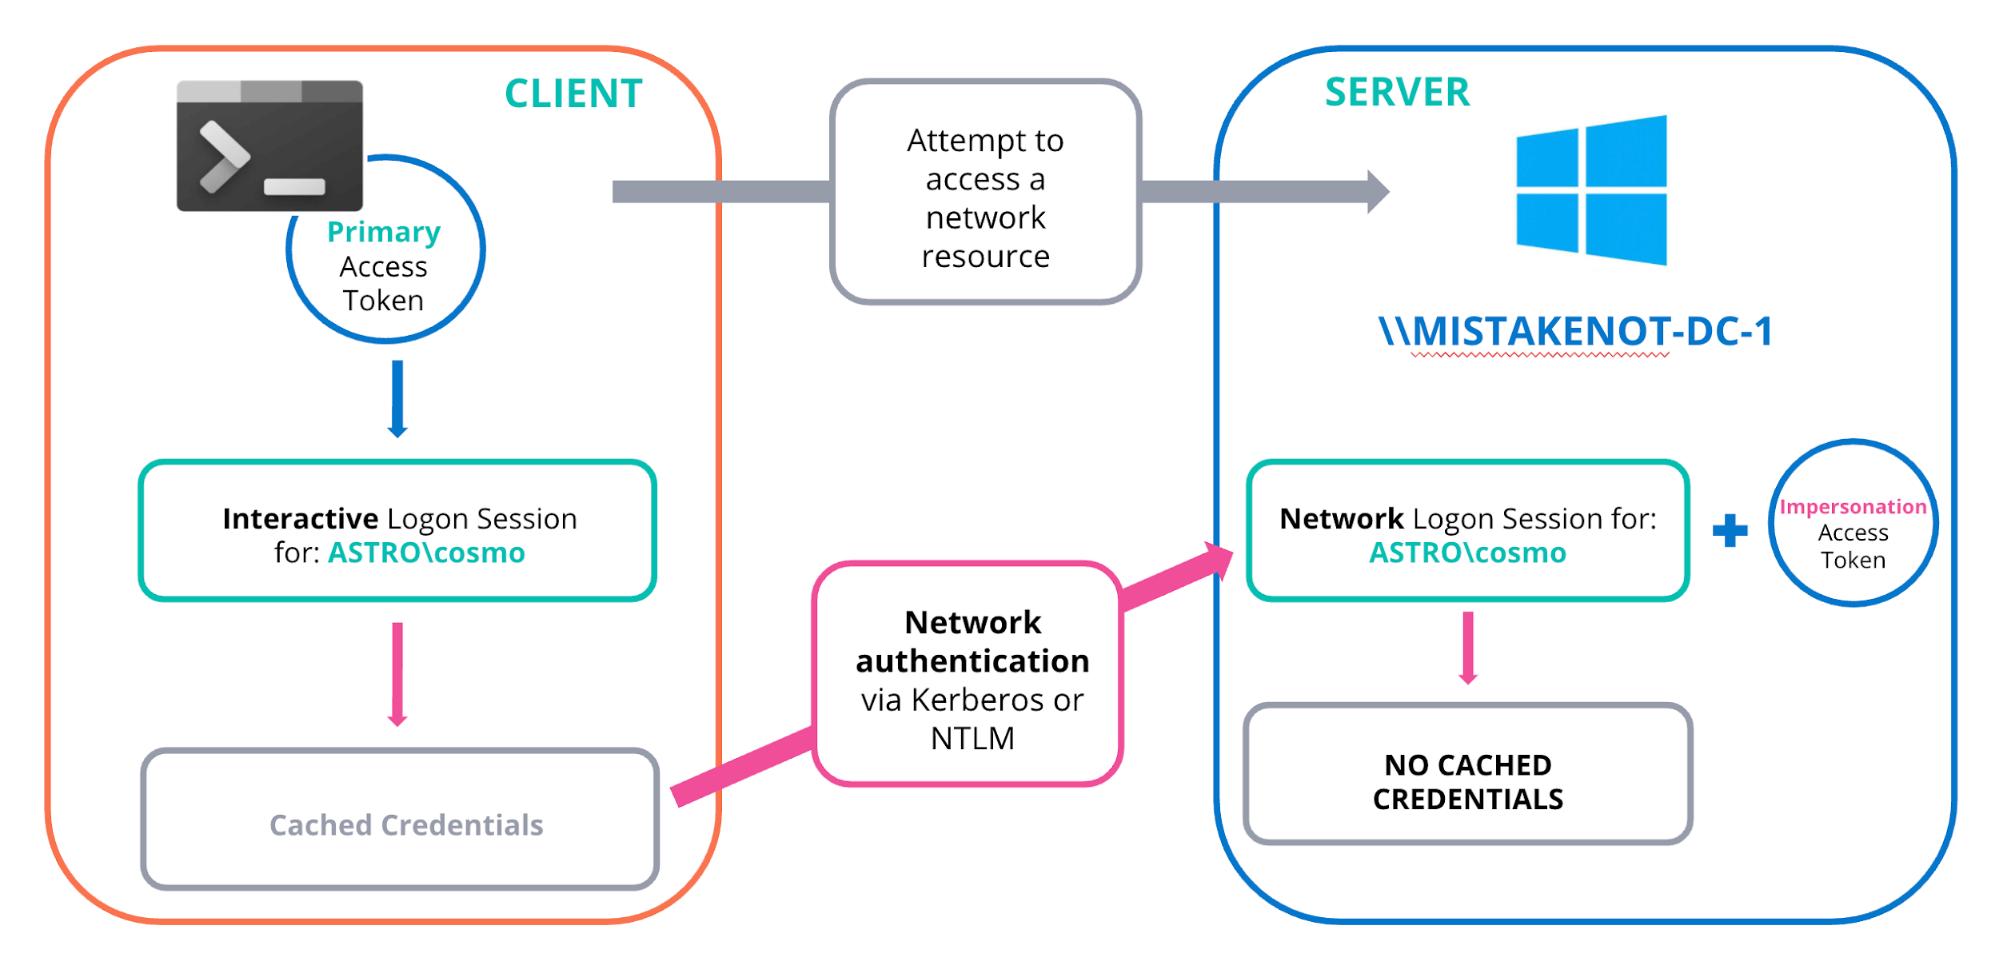 6-network-logon-blog-windows-tokens-for-defenders.png